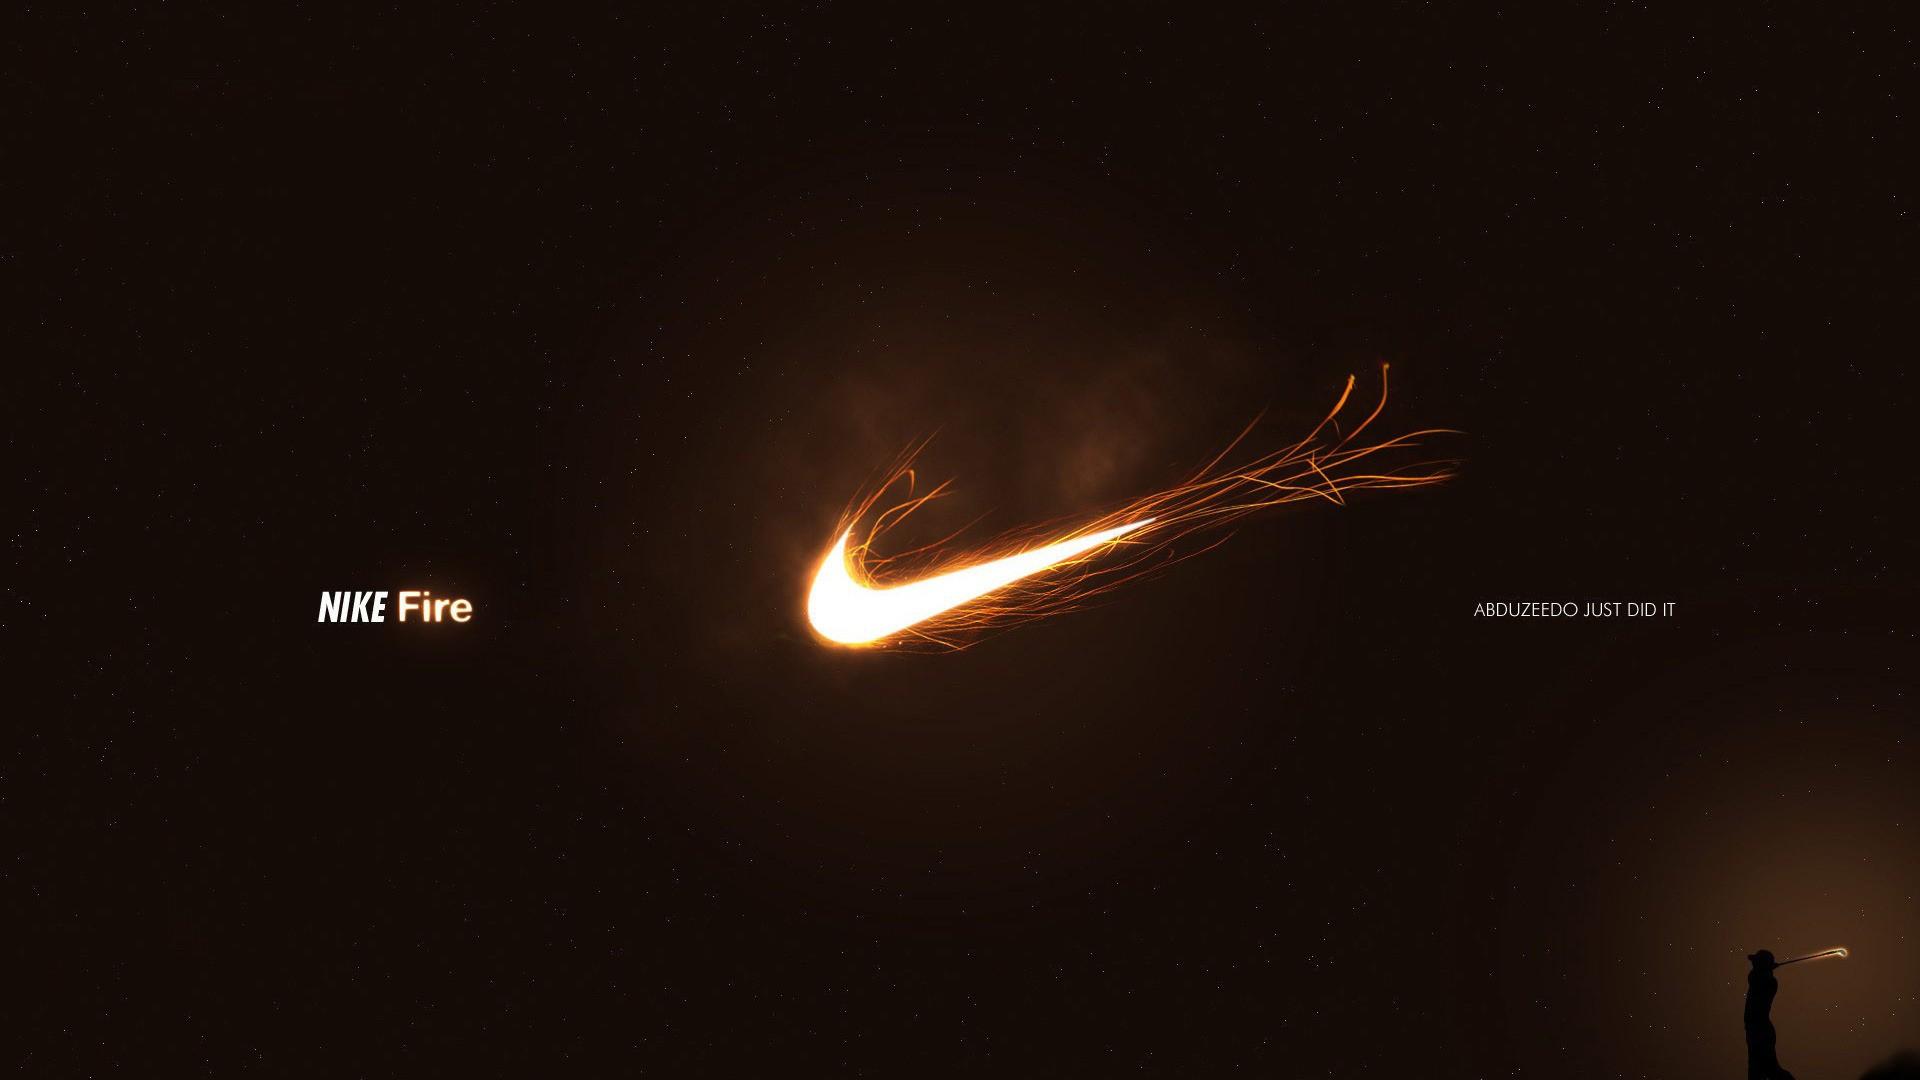 Sports Nike Wallpaper 1920x1080 Sports Nike Brands Logos 1920x1080